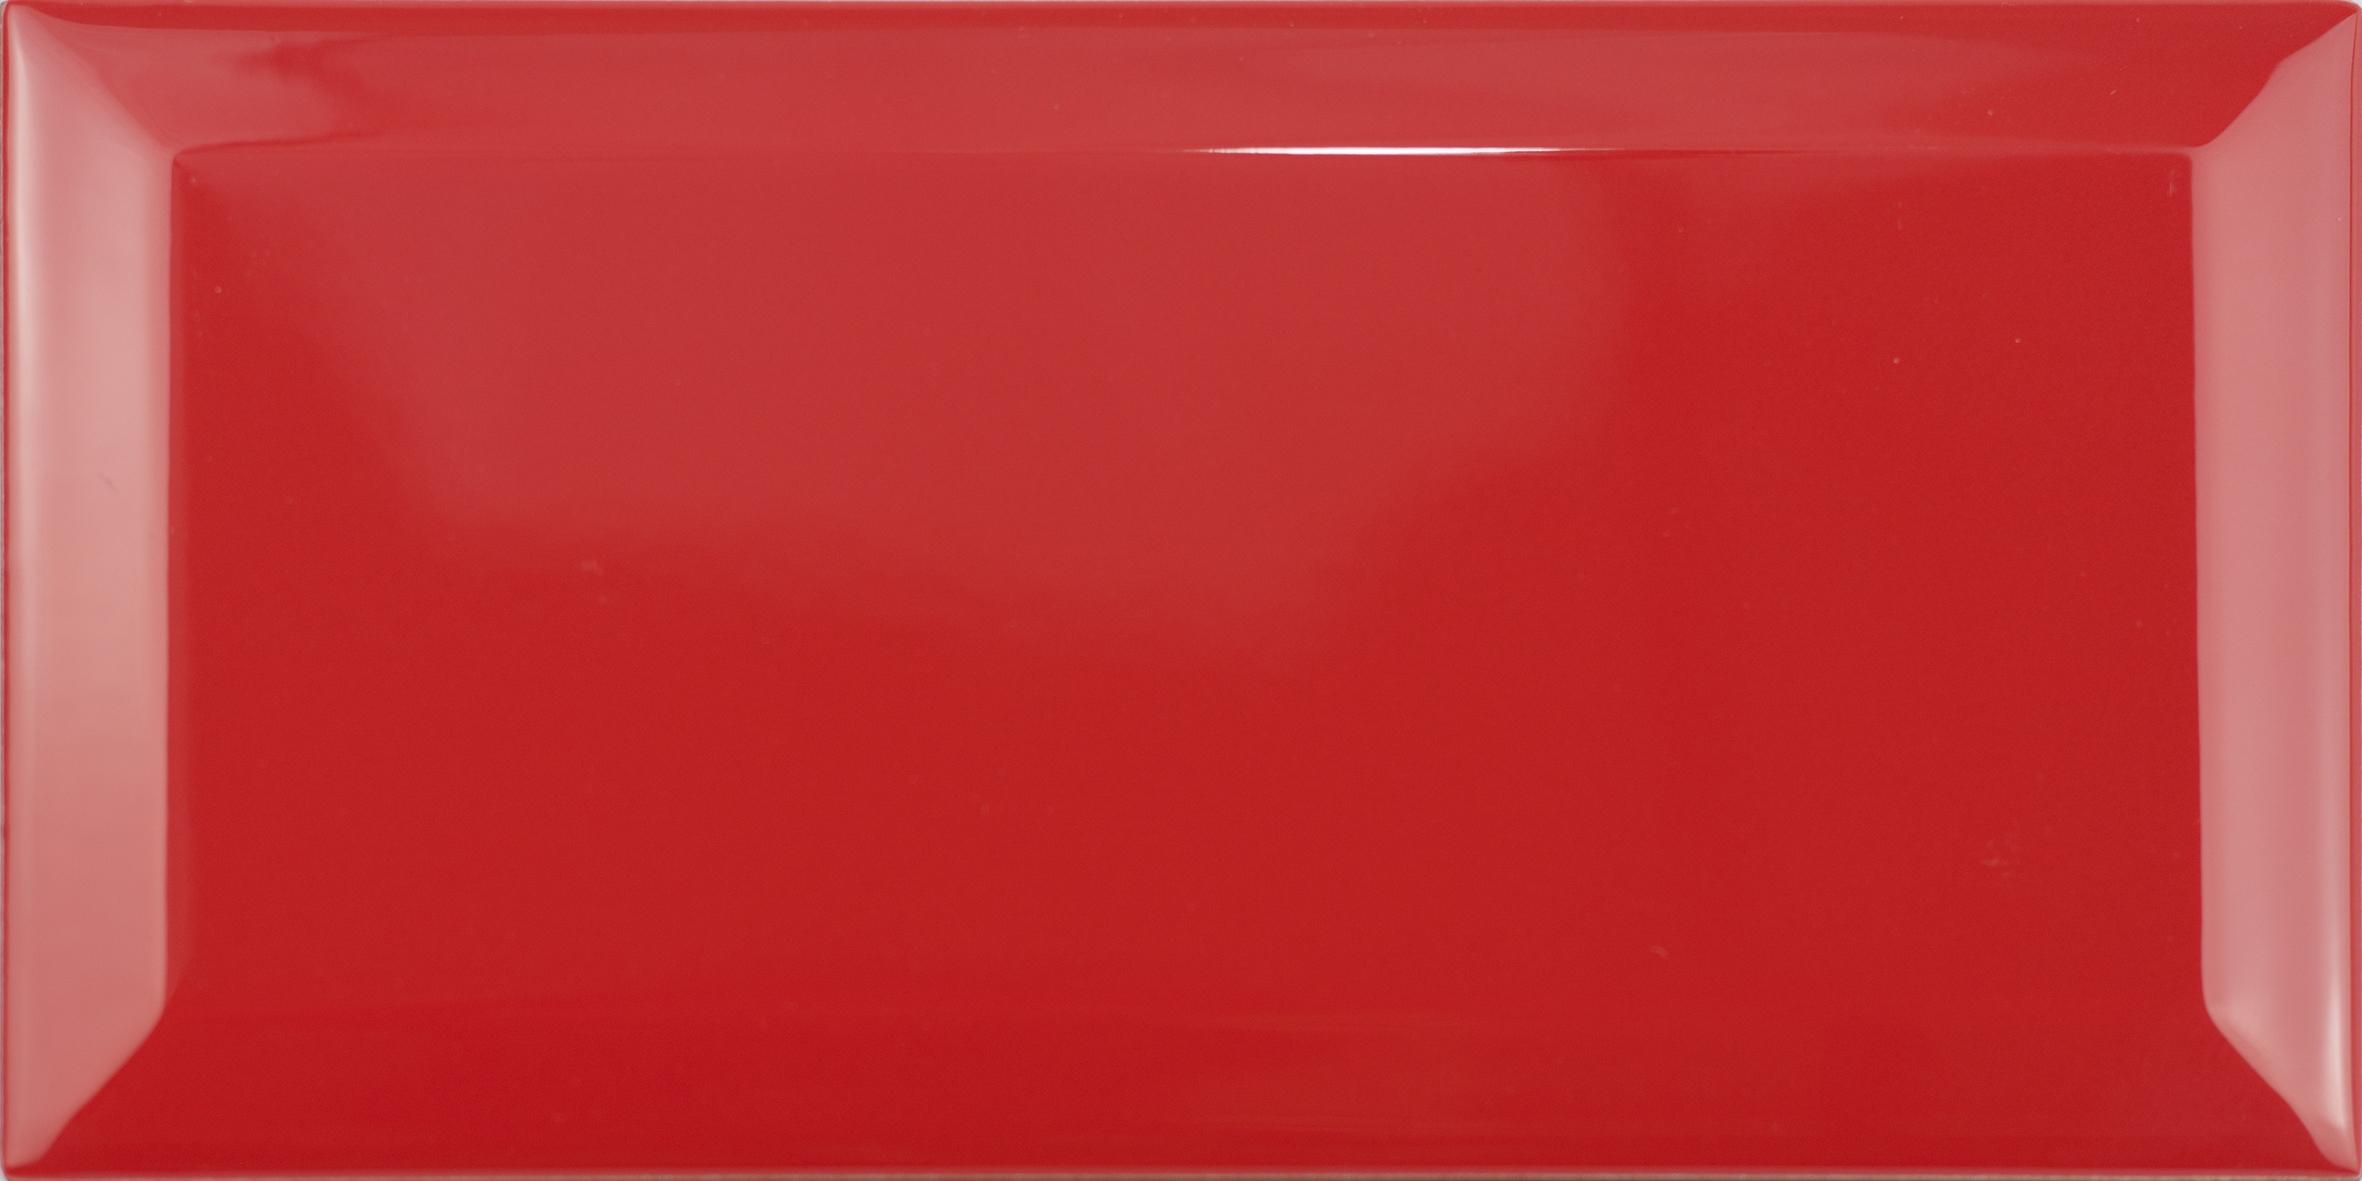 Wandtegel Biselado Rojo 10x20